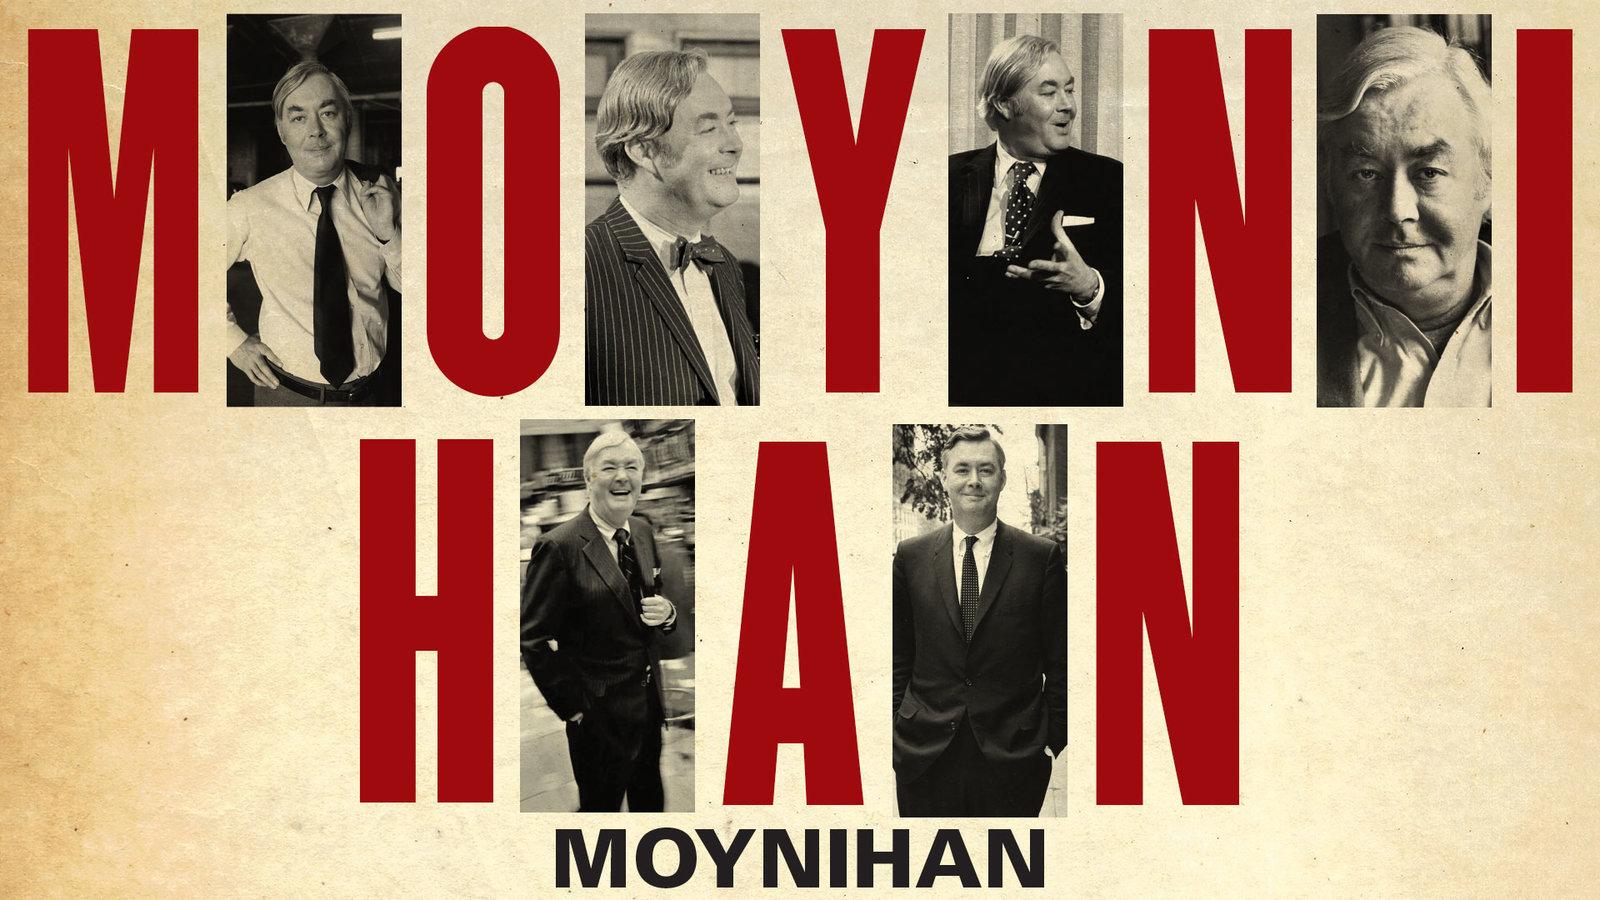 Moynihan - The Life and Political Career of a U.S. Senator